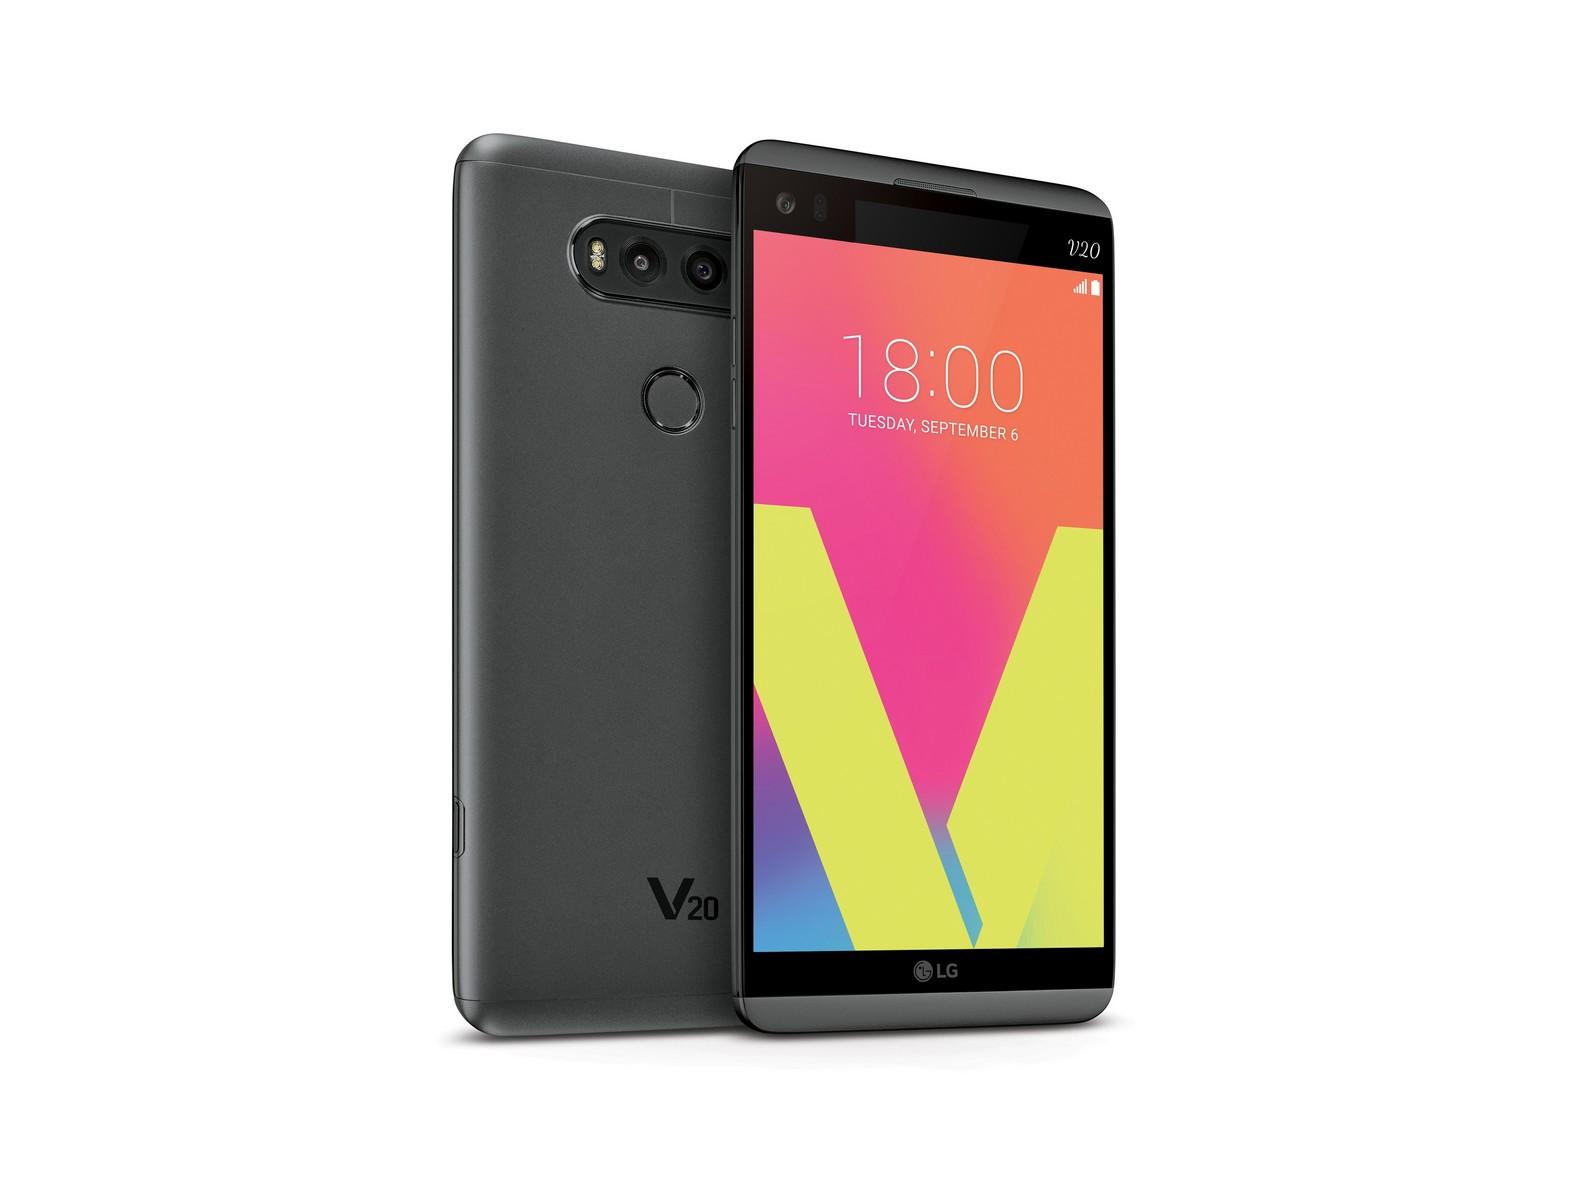 LG V20 official image